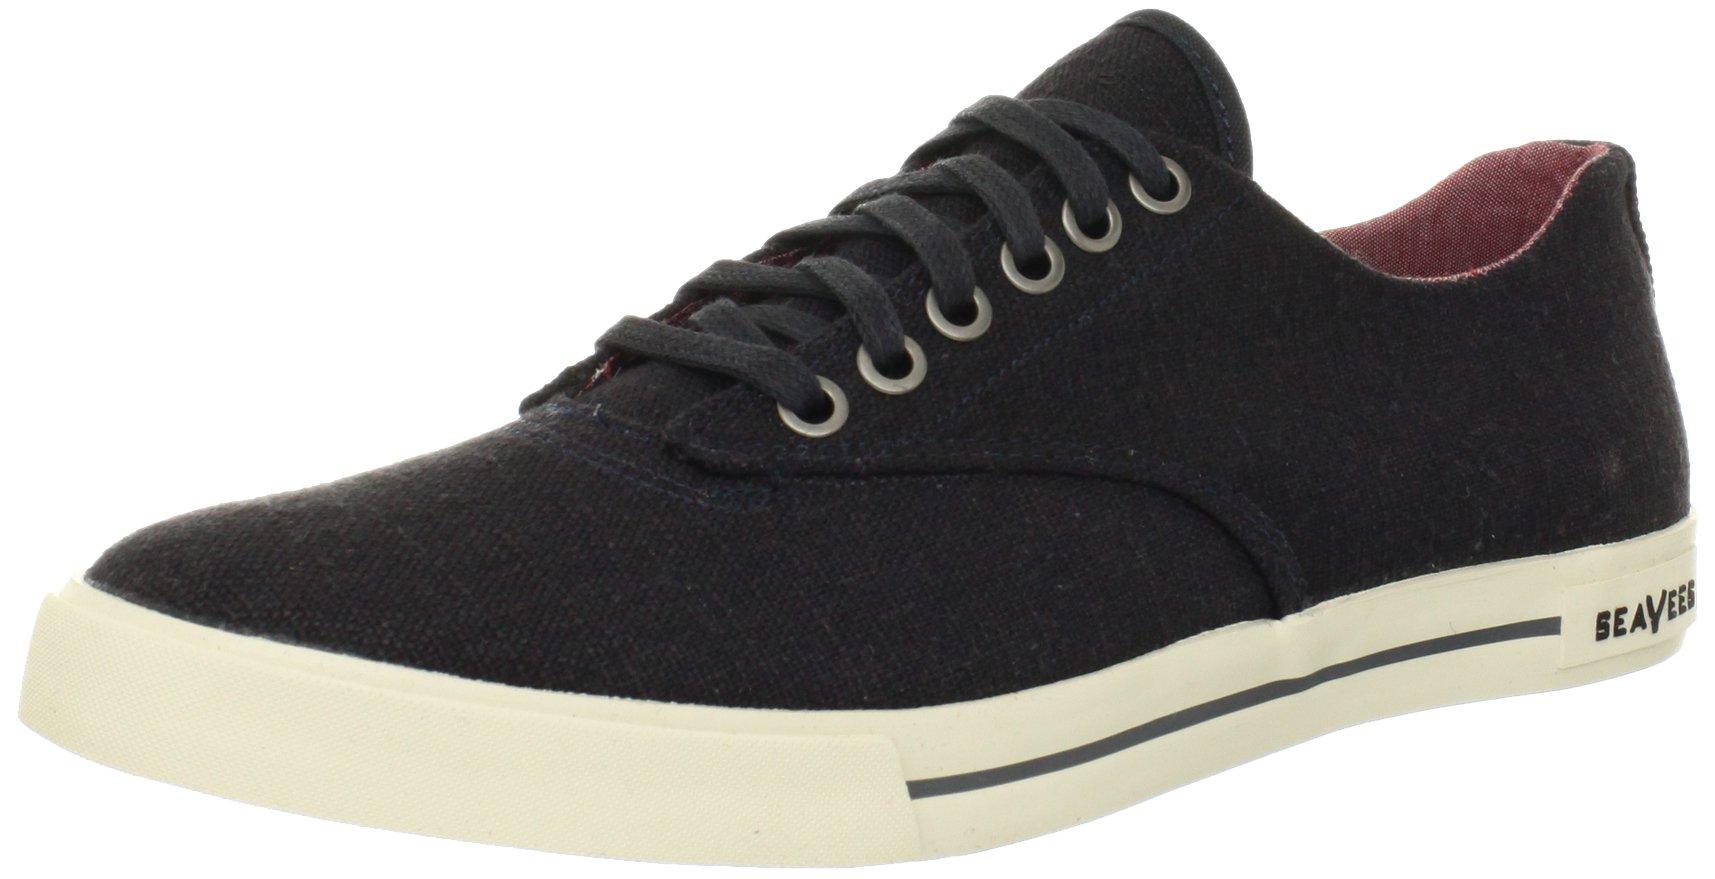 SeaVees Men's 08/63 Hermosa Plimsoll Core Tennis Shoe,Slate Navy Vintage Wash Linen,11.5 M US